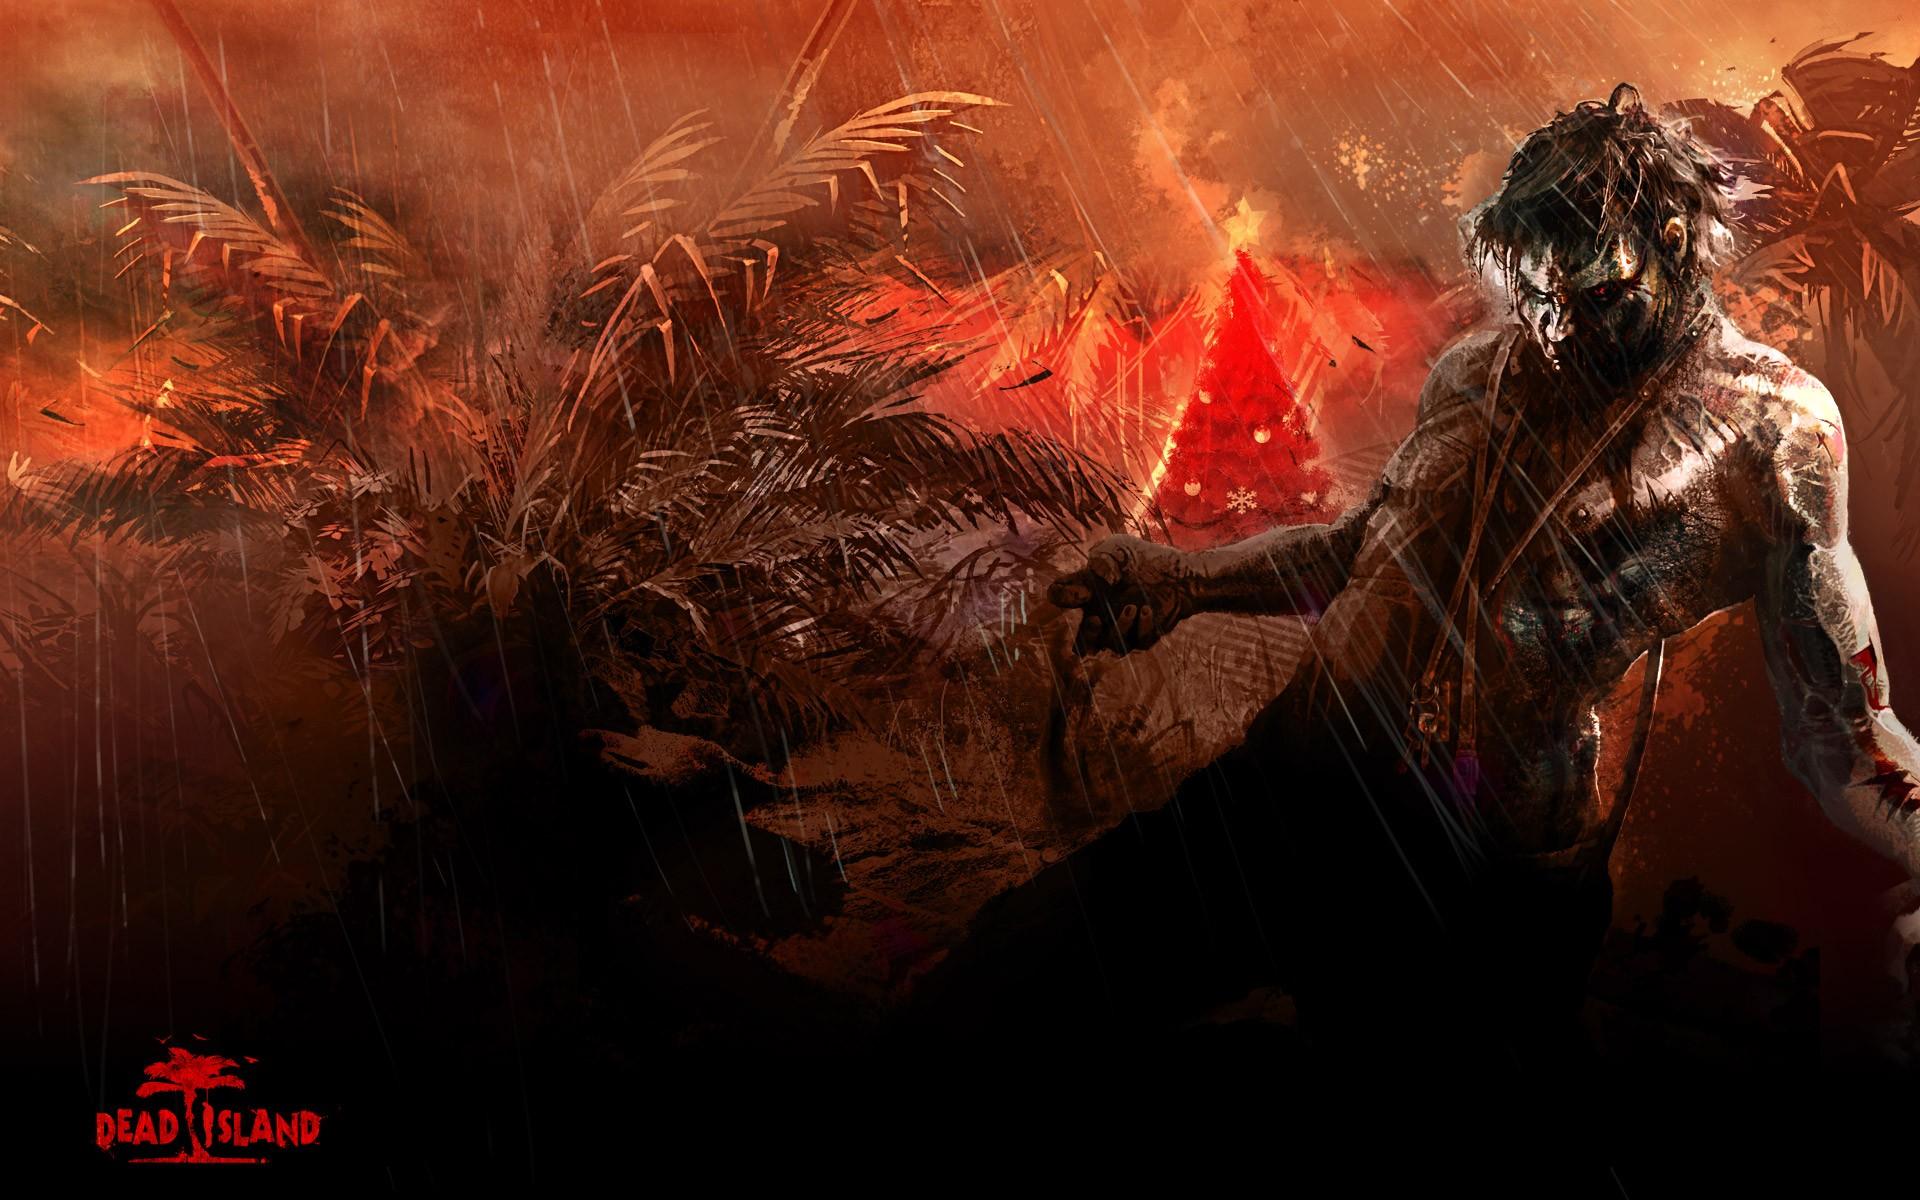 20 HD Dead Island Game Wallpapers - HDWallSource.com